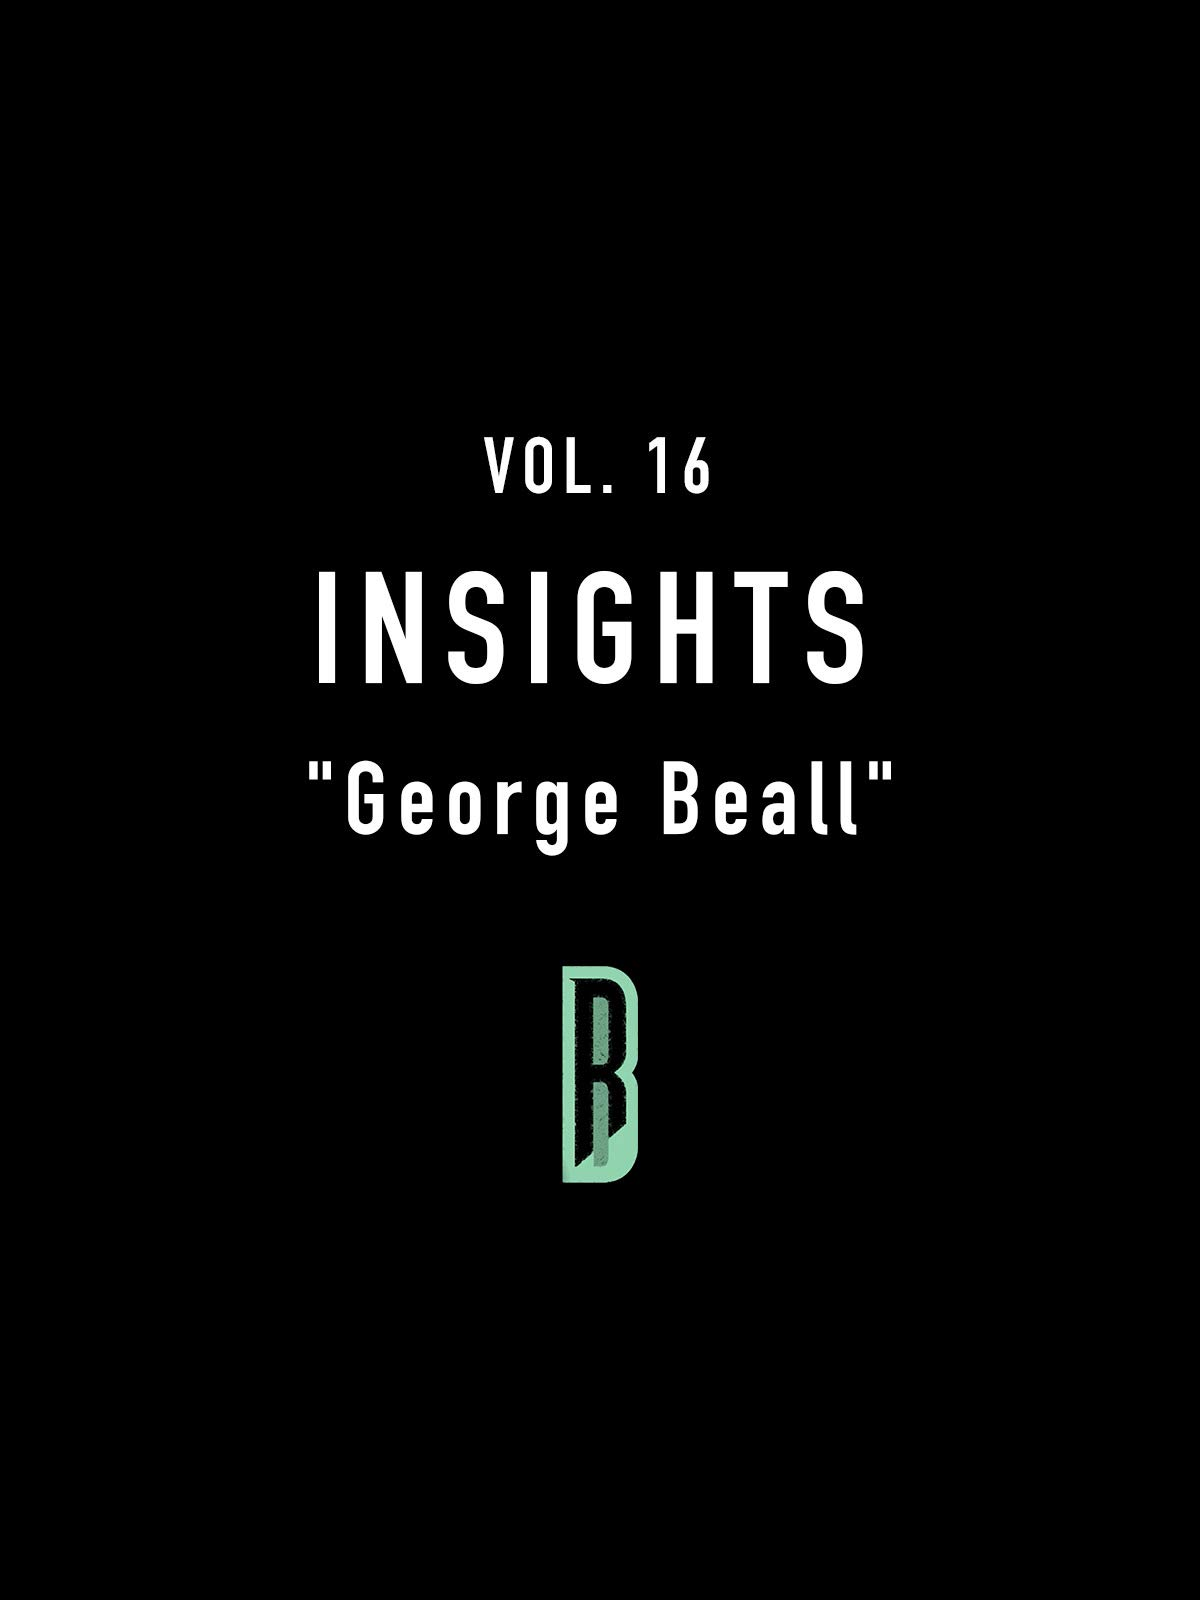 Insights Vol. 16